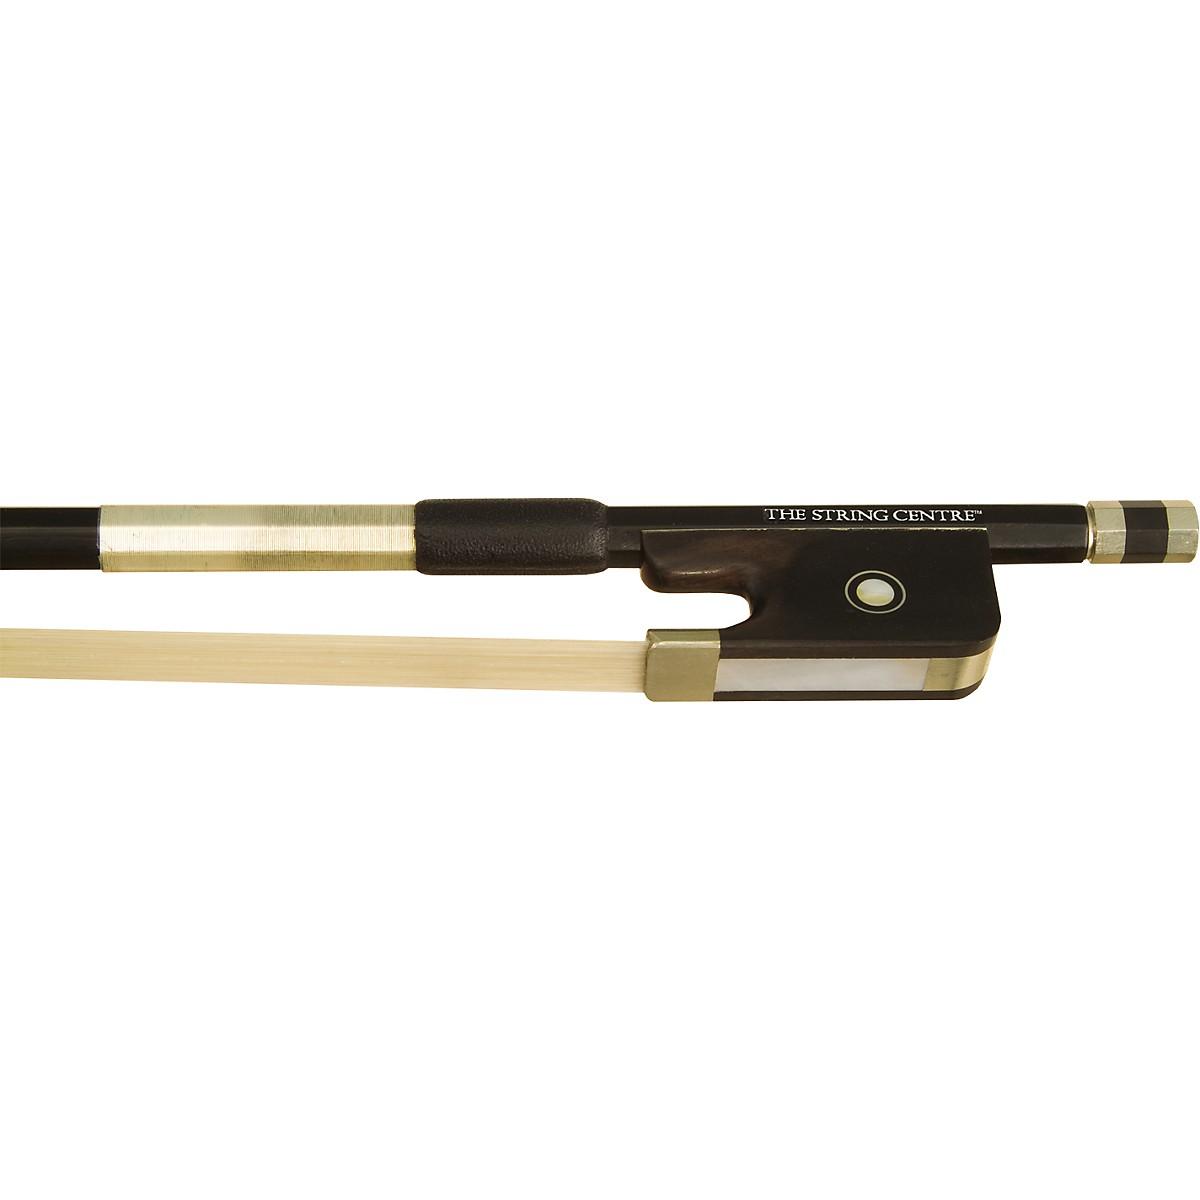 The String Centre FG Deluxe Series Fiberglass Composite Viola Bow